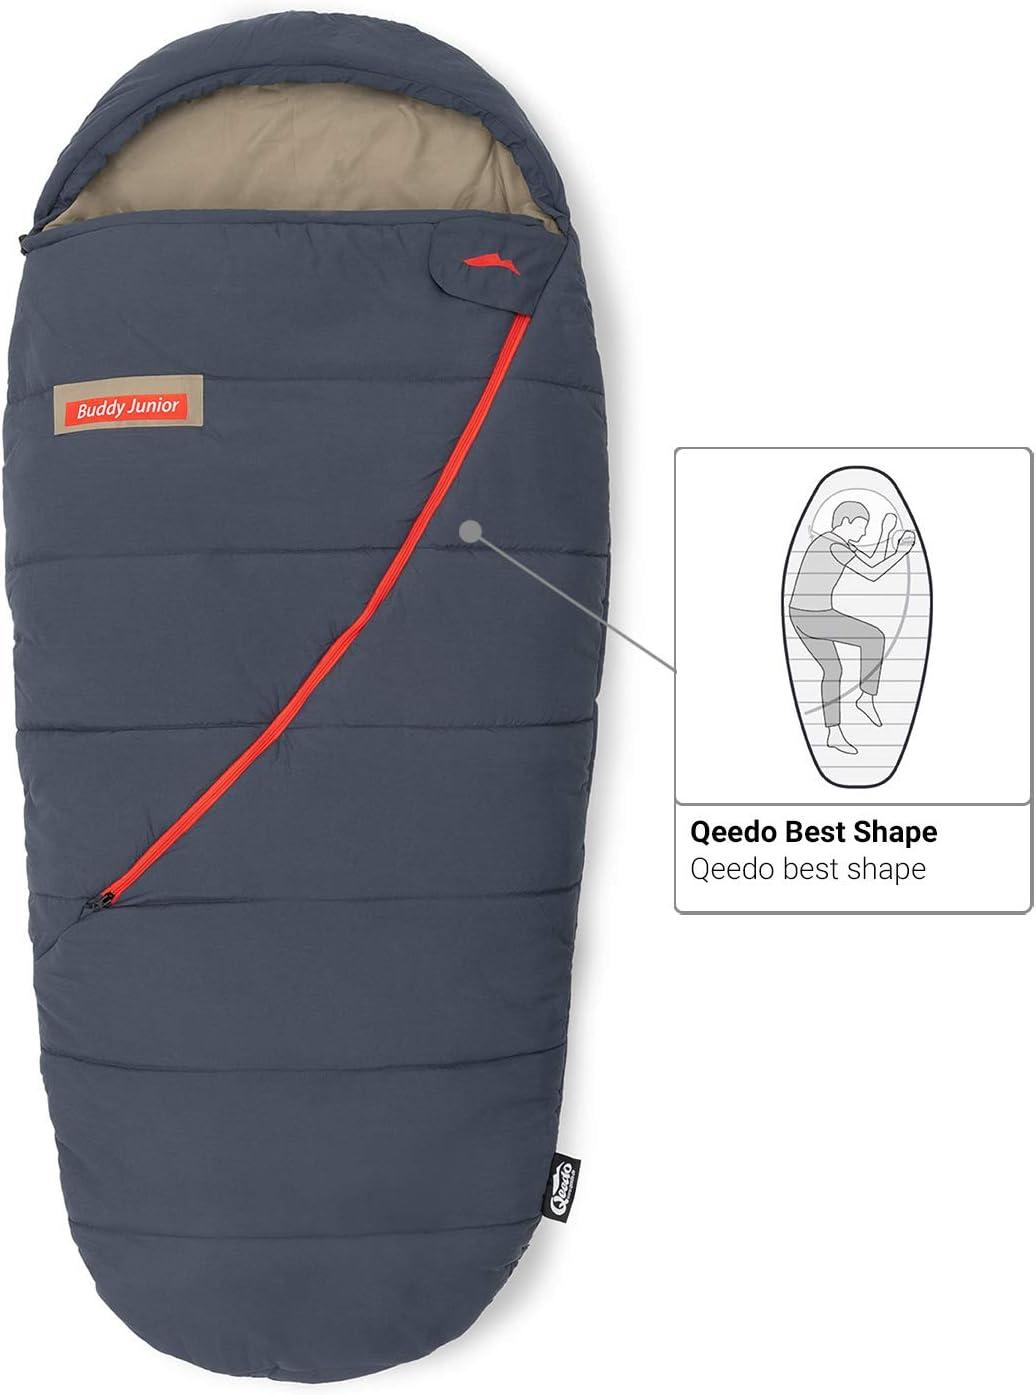 Best Shape Comfort Control Qeedo Buddy Junior Sac de Couchage Enfant Soft Touch